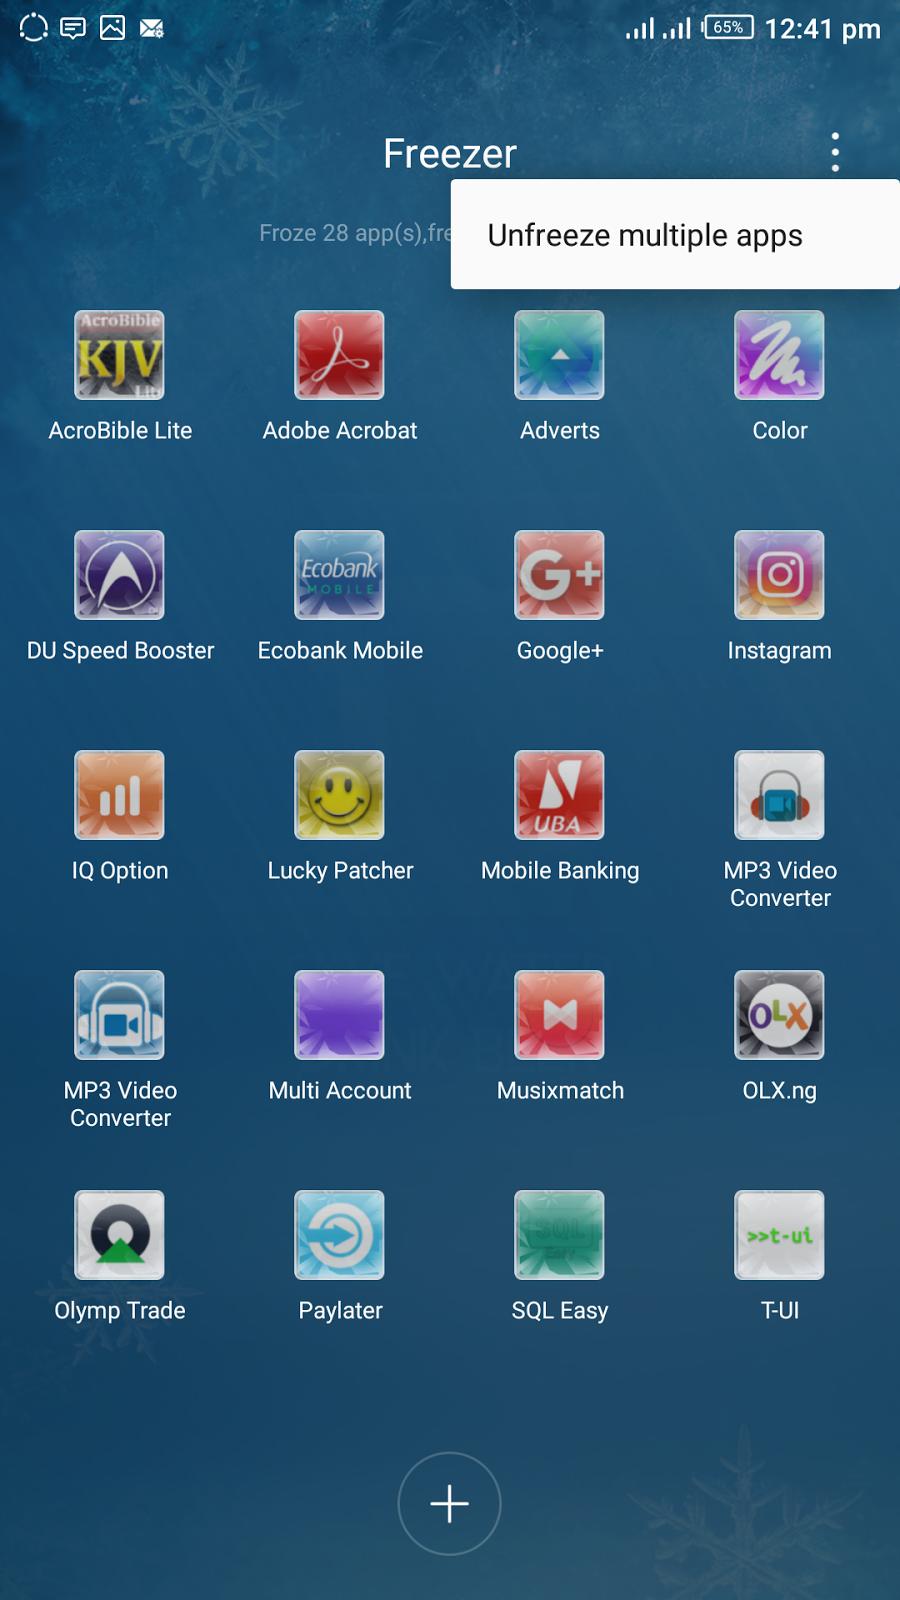 unfreeze multiple apps